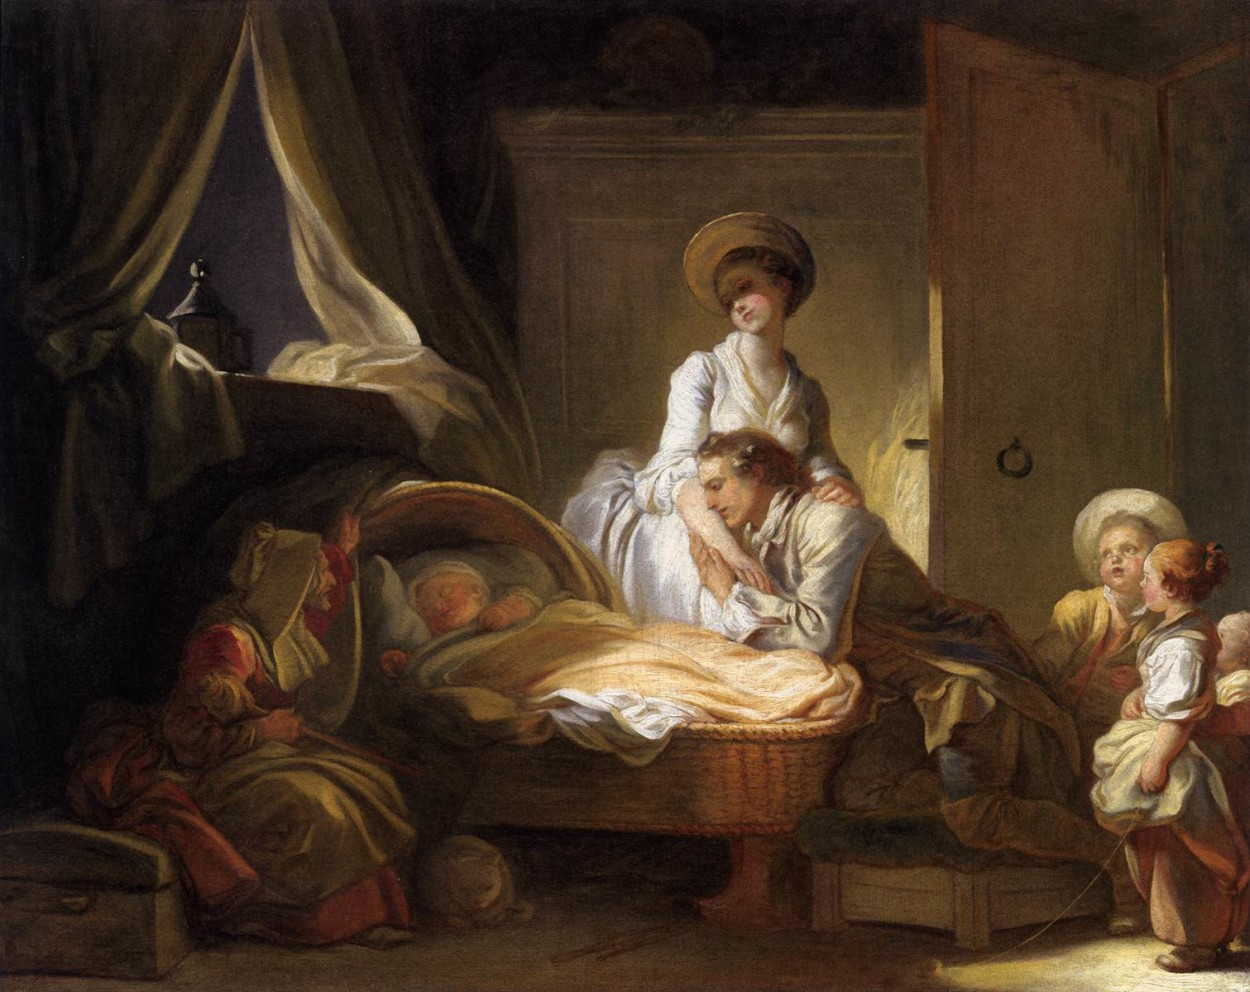 A Visit to the Nursery Jean Honoré Fragonard Oil on Canvas 1775 National Gallery of Art, Washington, DC